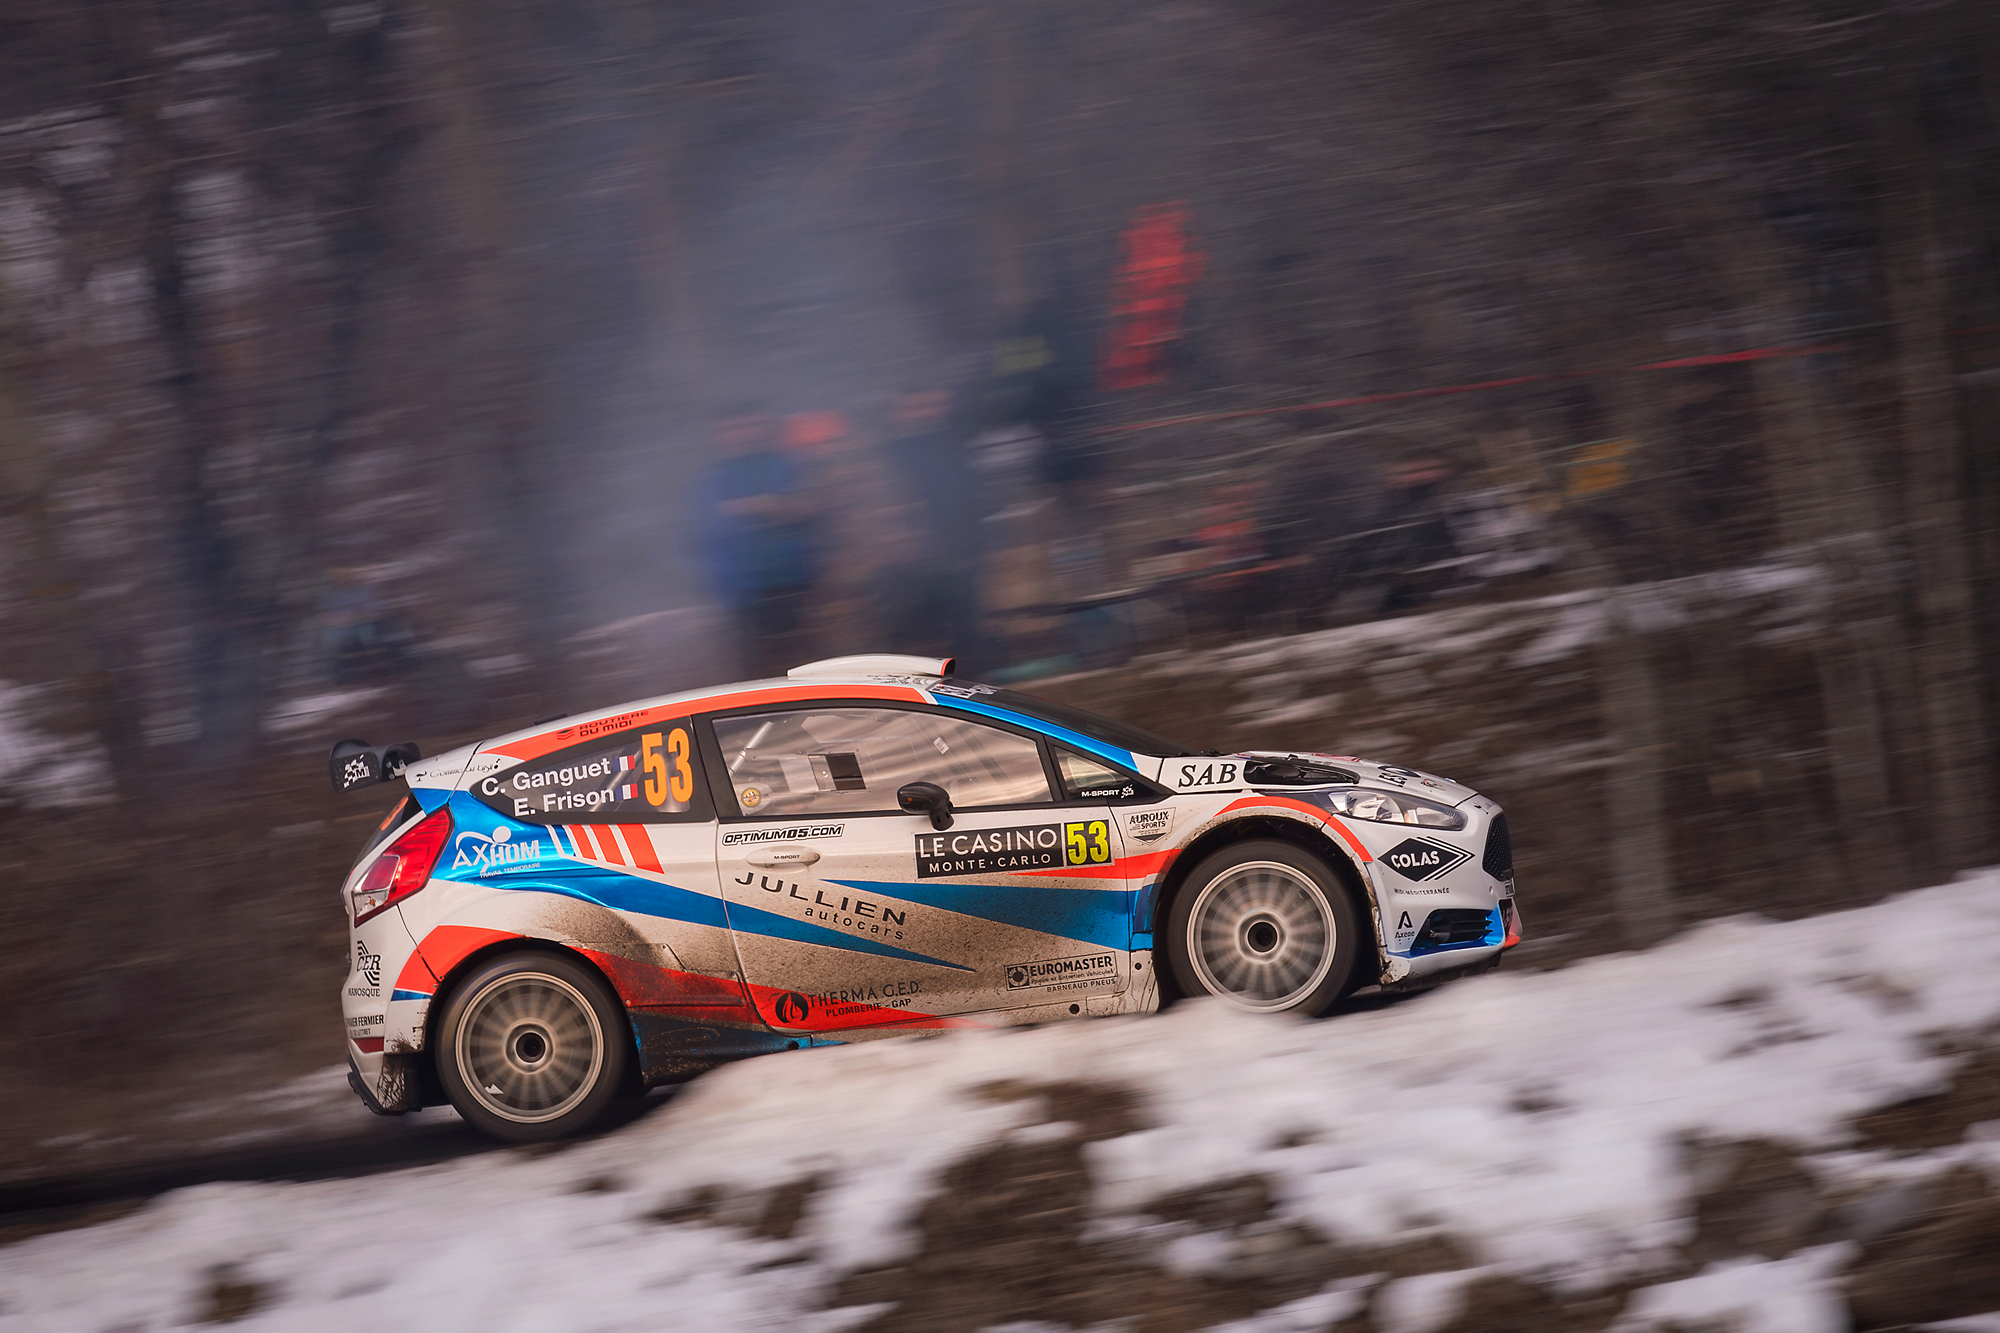 WRC Rallye de Monte Carlo 2020 - Ganguet/Frison...